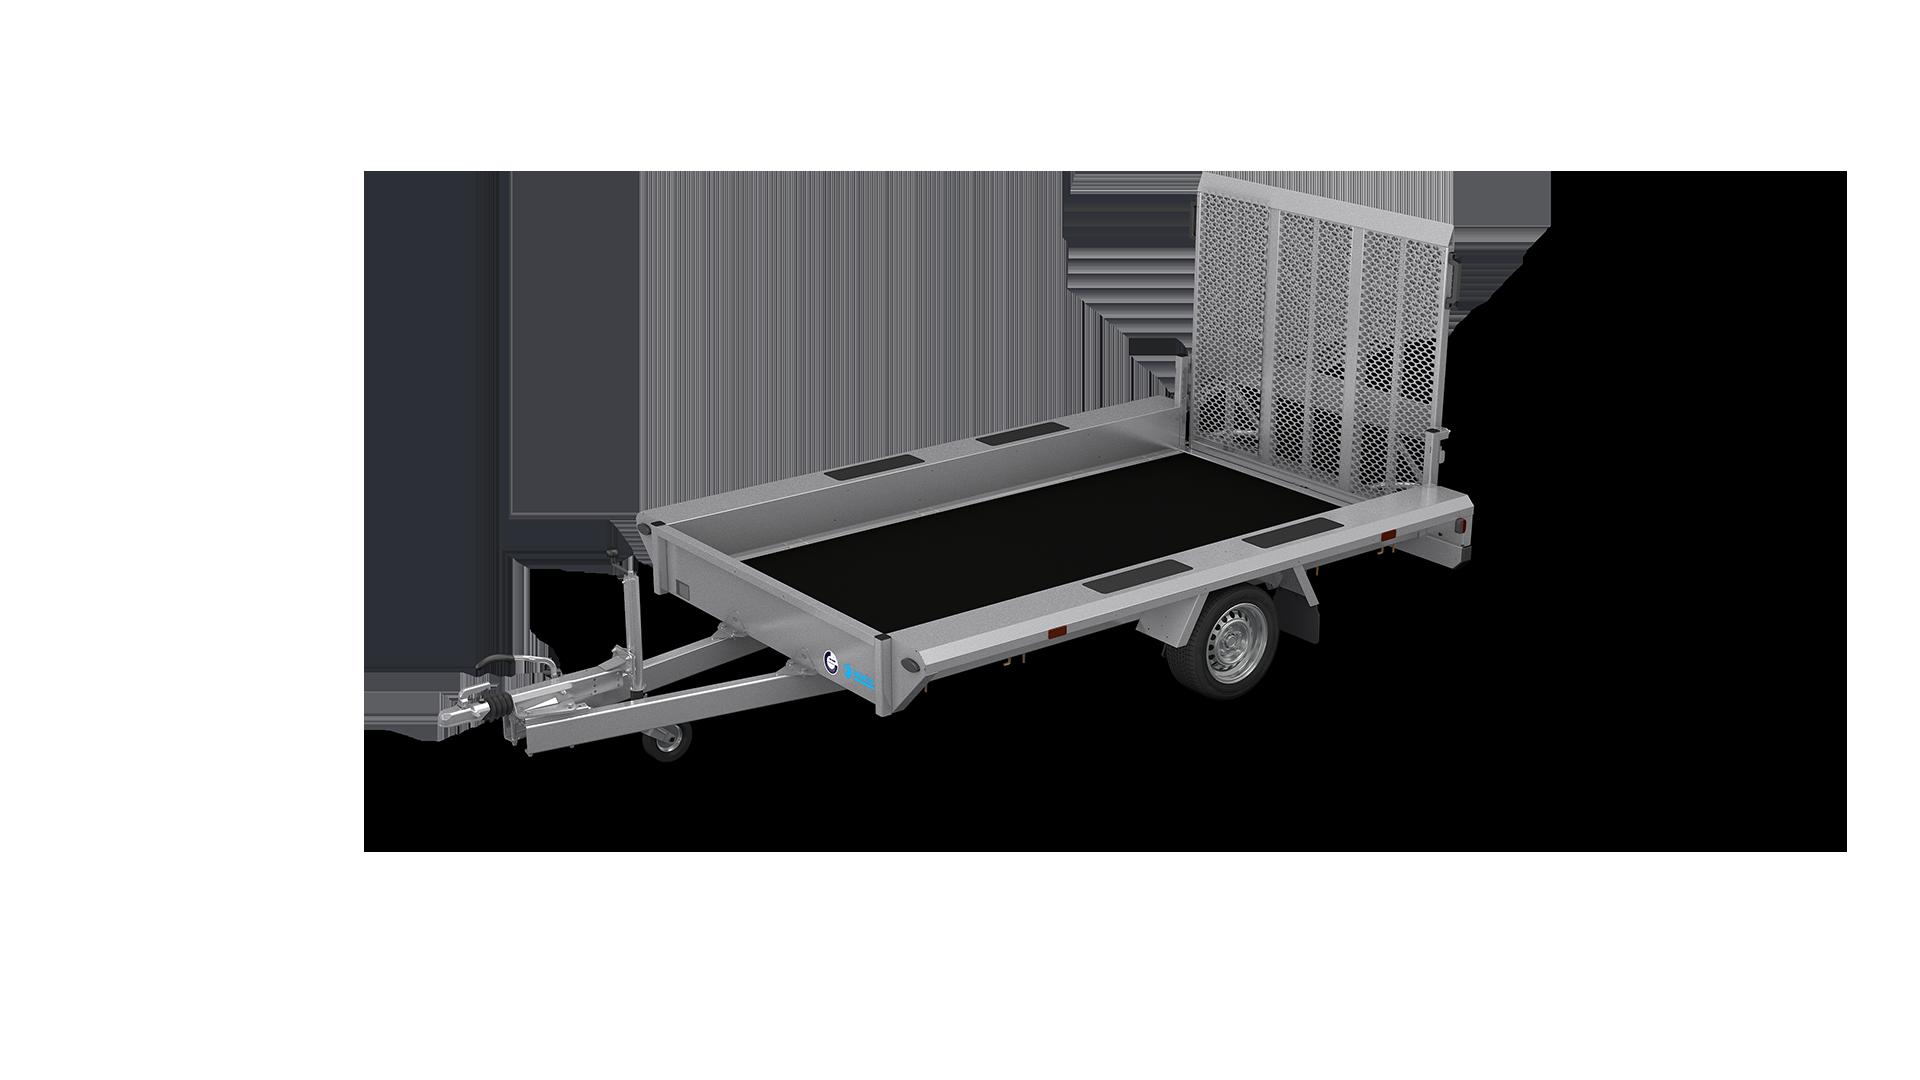 HAPERT transport trailer INDIGO LF-1 non-tilting machine transporter